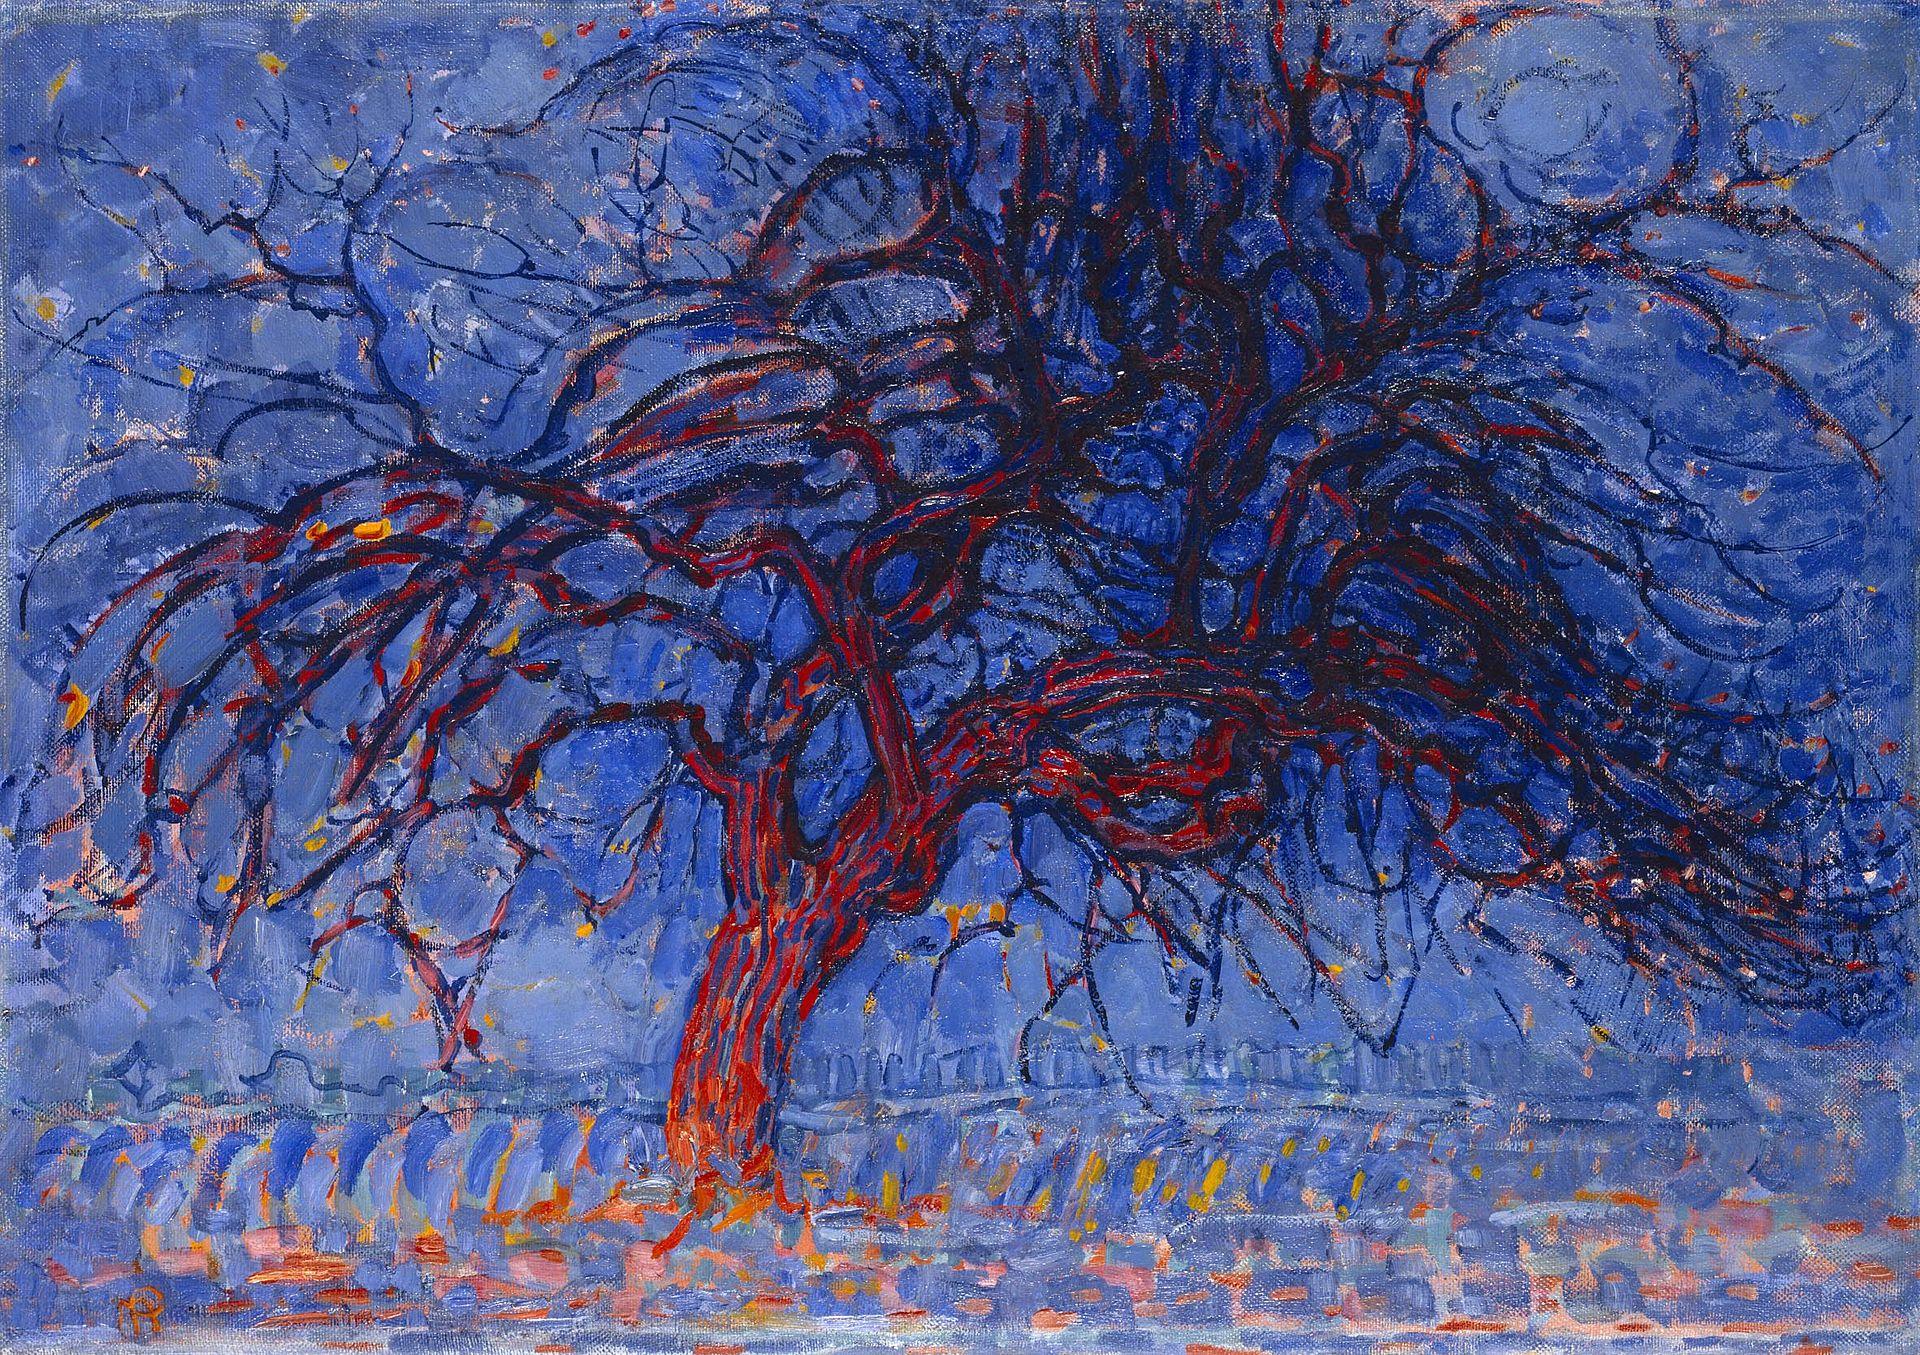 Piet Mondrian,  Evening; Red Tree , 1908–10, Municipal Museum, The Hague.